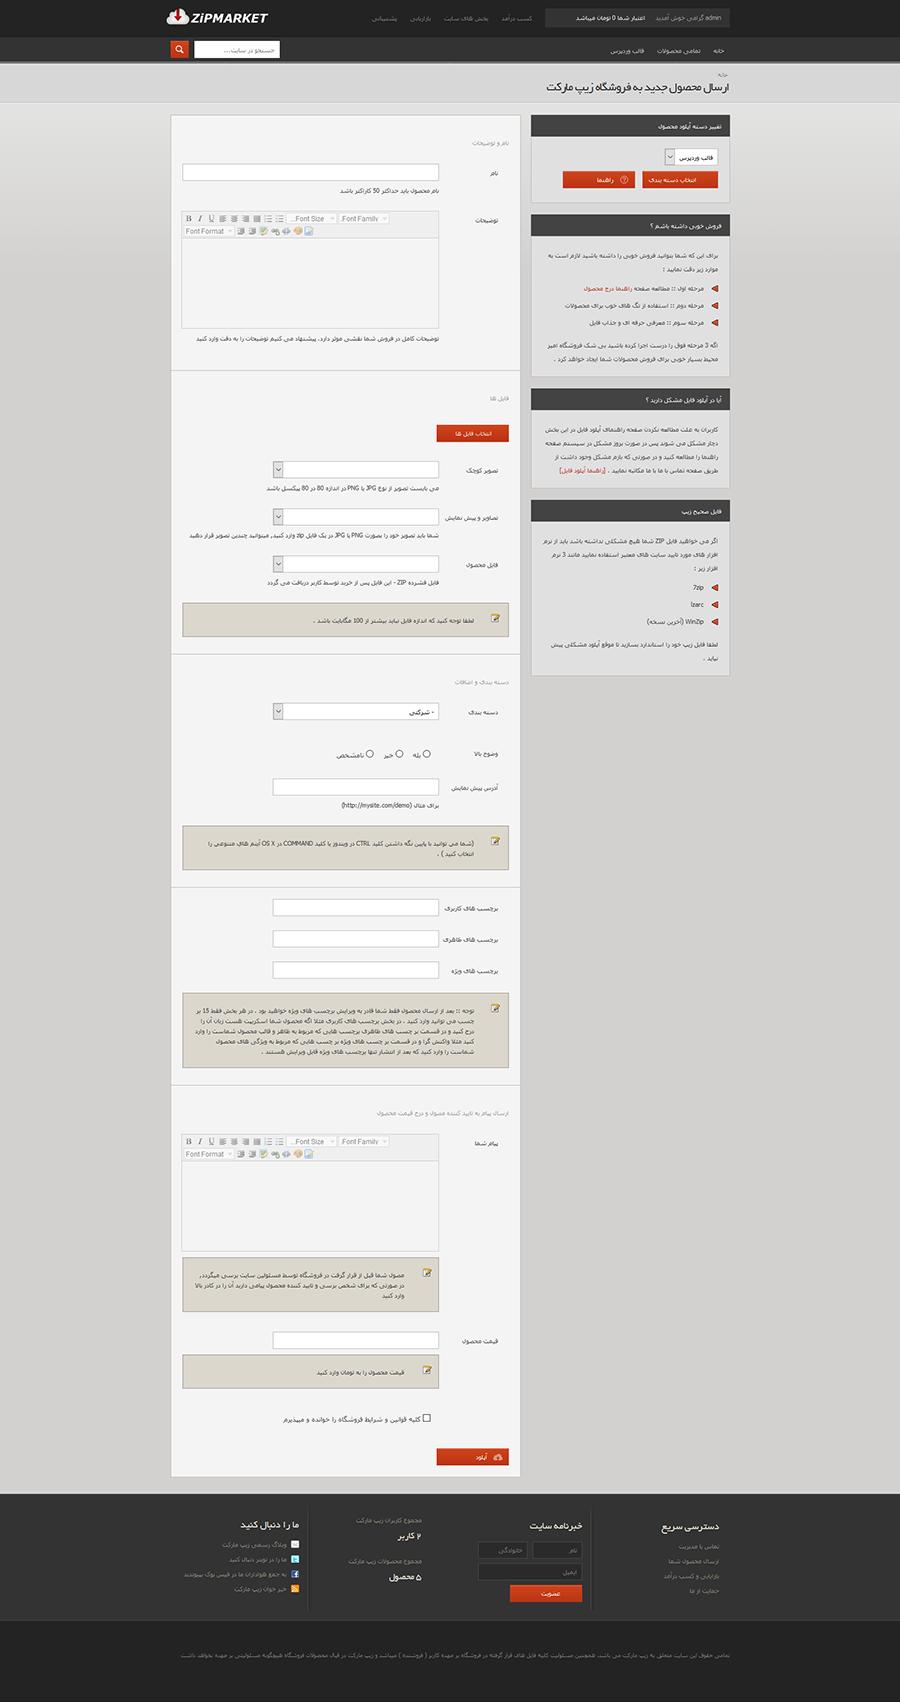 zipmarket3 - اسکریپت فروش محصولات مجازی زیپ مارکت